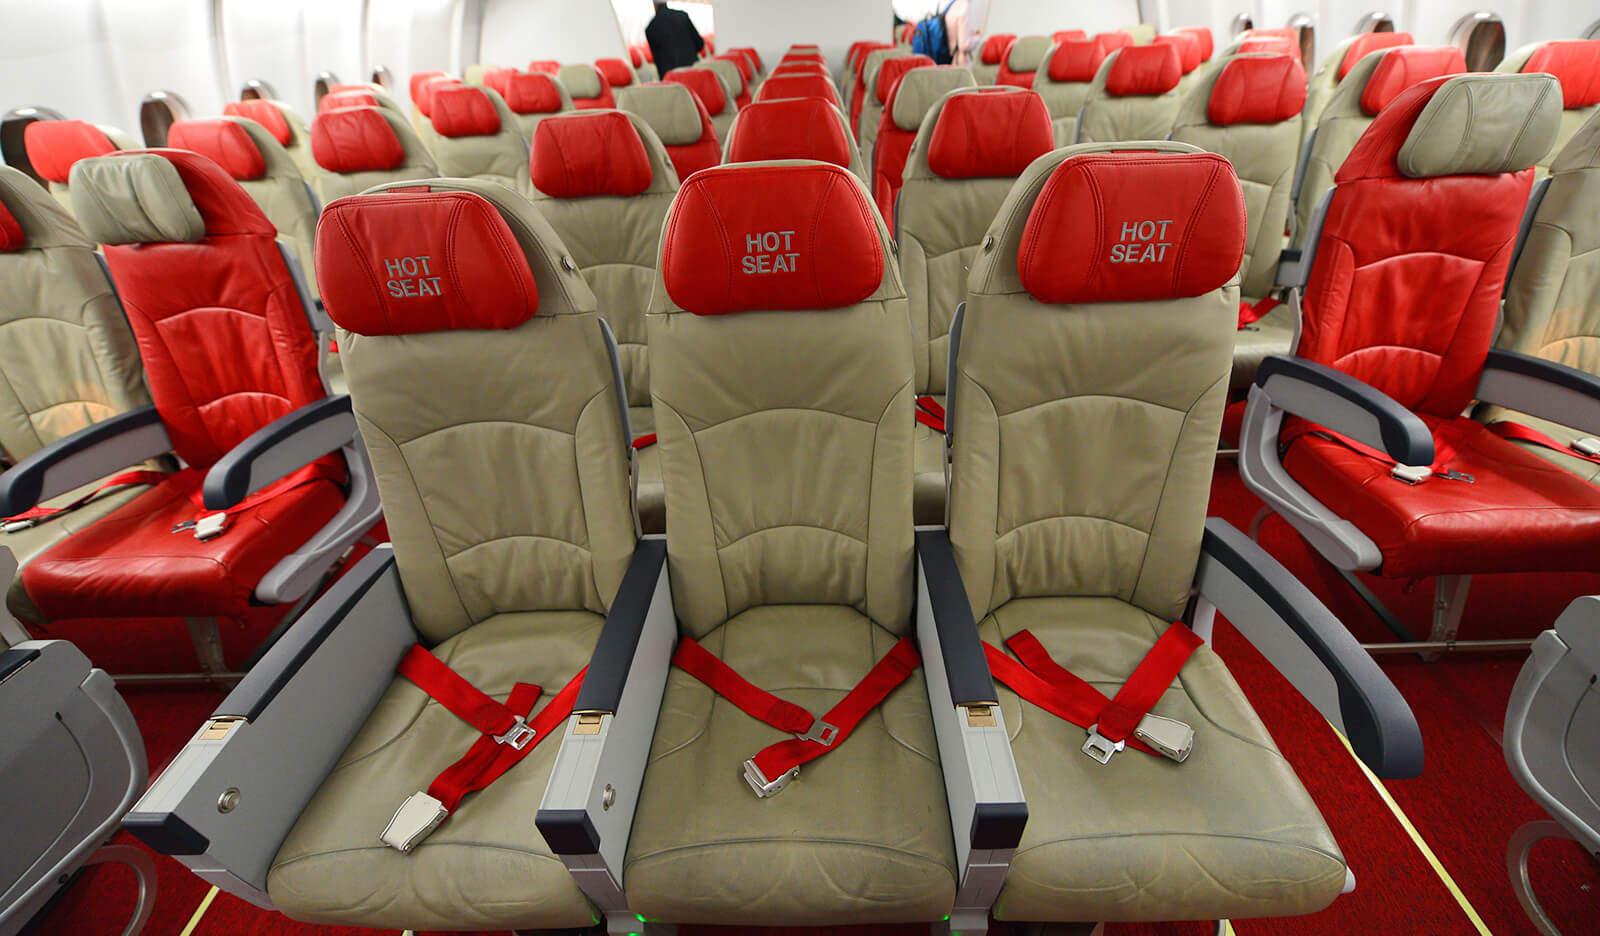 AirAsia Hot Seat Airbus A330 3-3-3